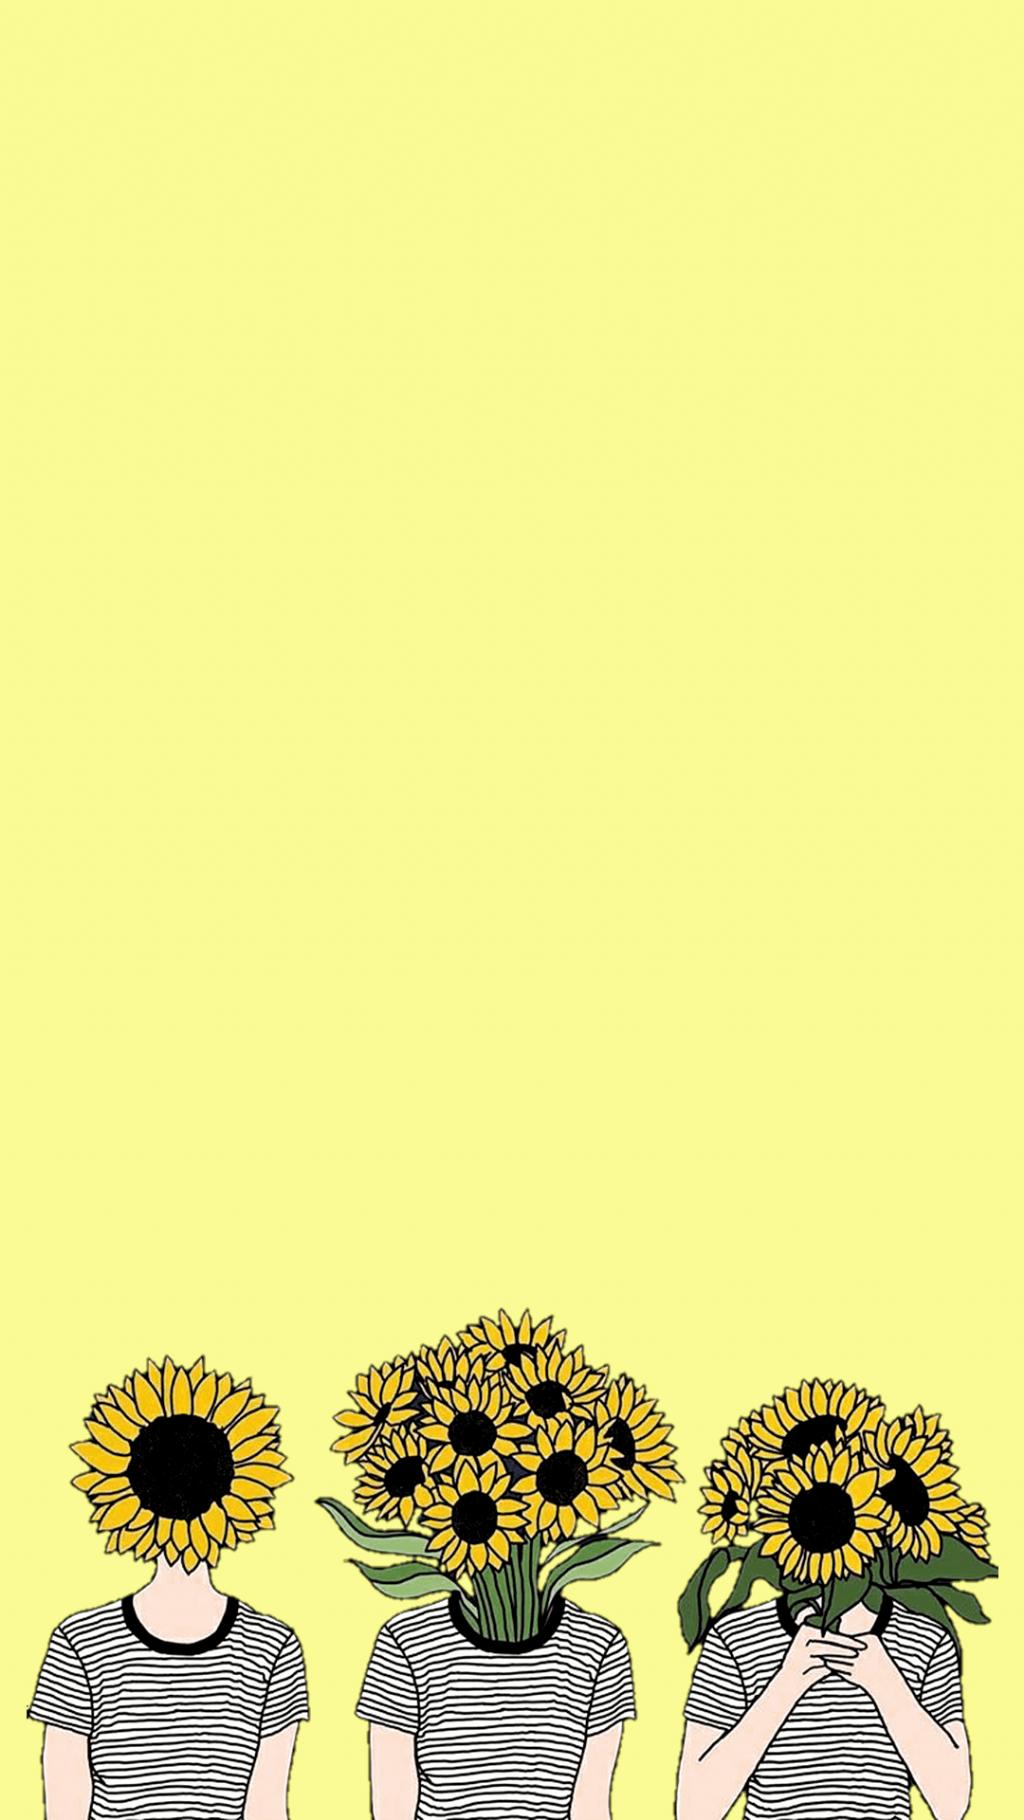 Yellow Aesthetic Tumblr Desktop Wallpapers Wallpaper Aesthetic Wallpaper Wallpaperaestheti In 2020 Yellow Aesthetic Aesthetic Desktop Wallpaper Aesthetic Wallpapers